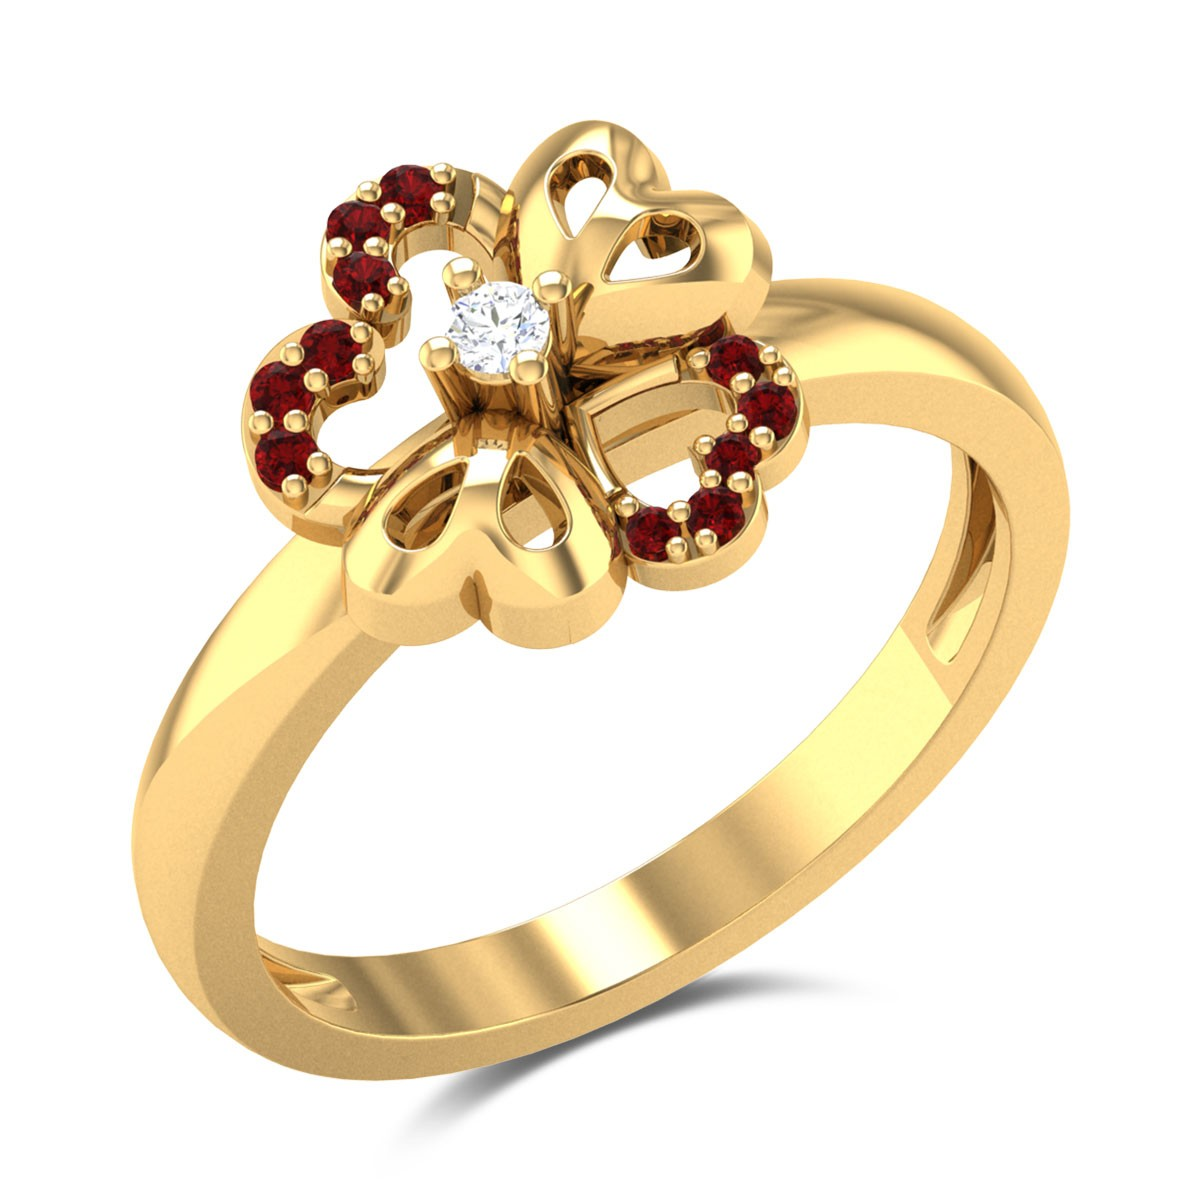 Blooming Scarlet Diamond Ring